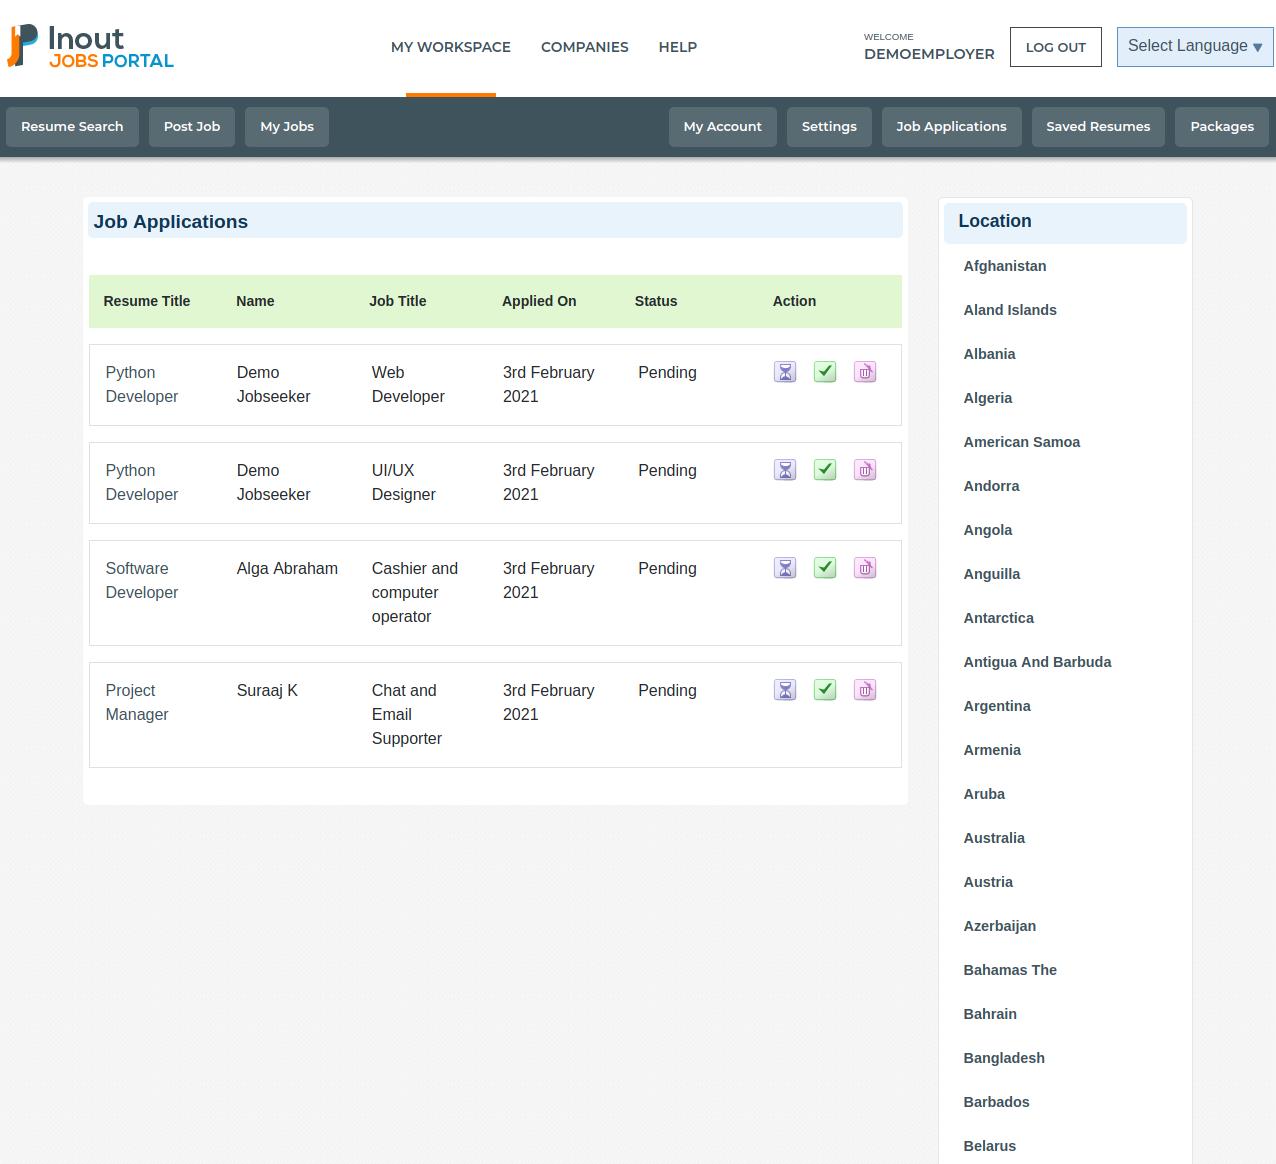 Inout Jobs Portal - Screenshot 5